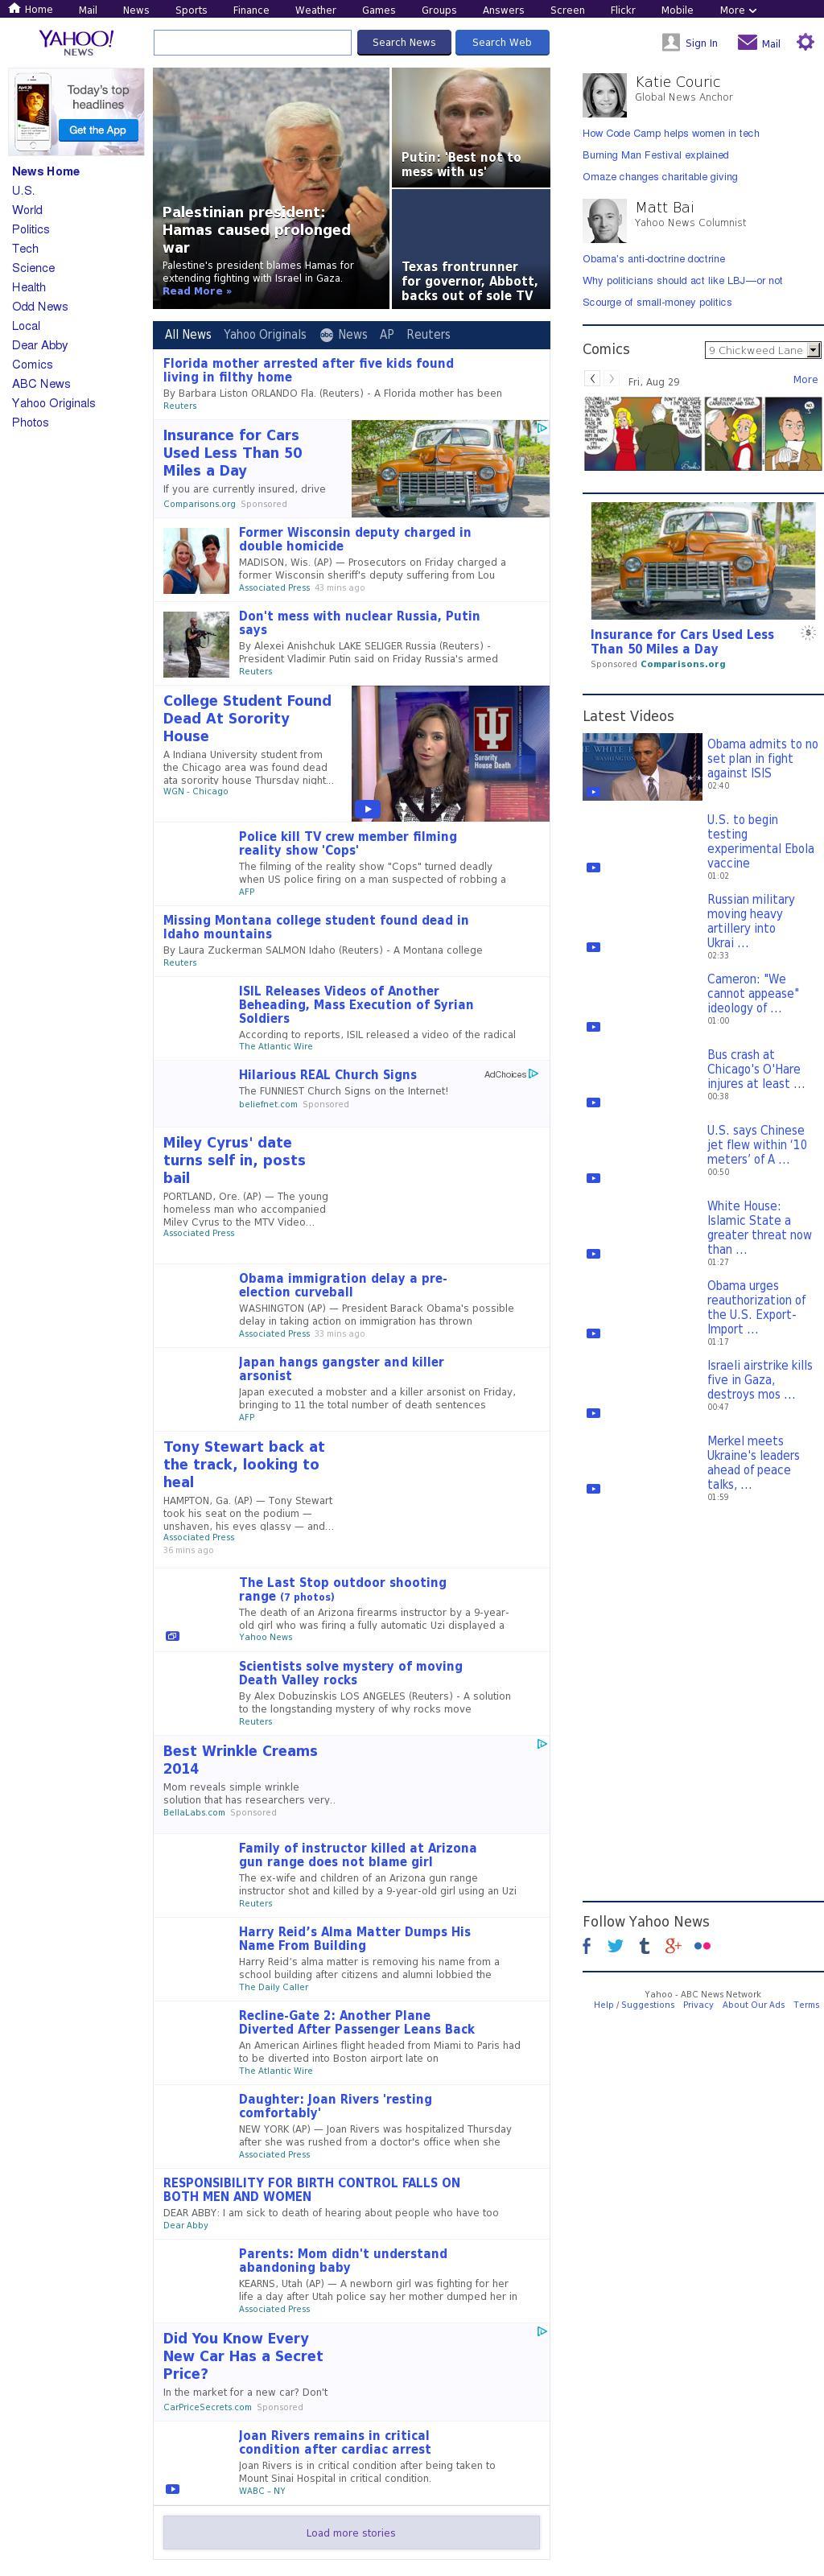 Yahoo! News at Friday Aug. 29, 2014, 10:19 p.m. UTC